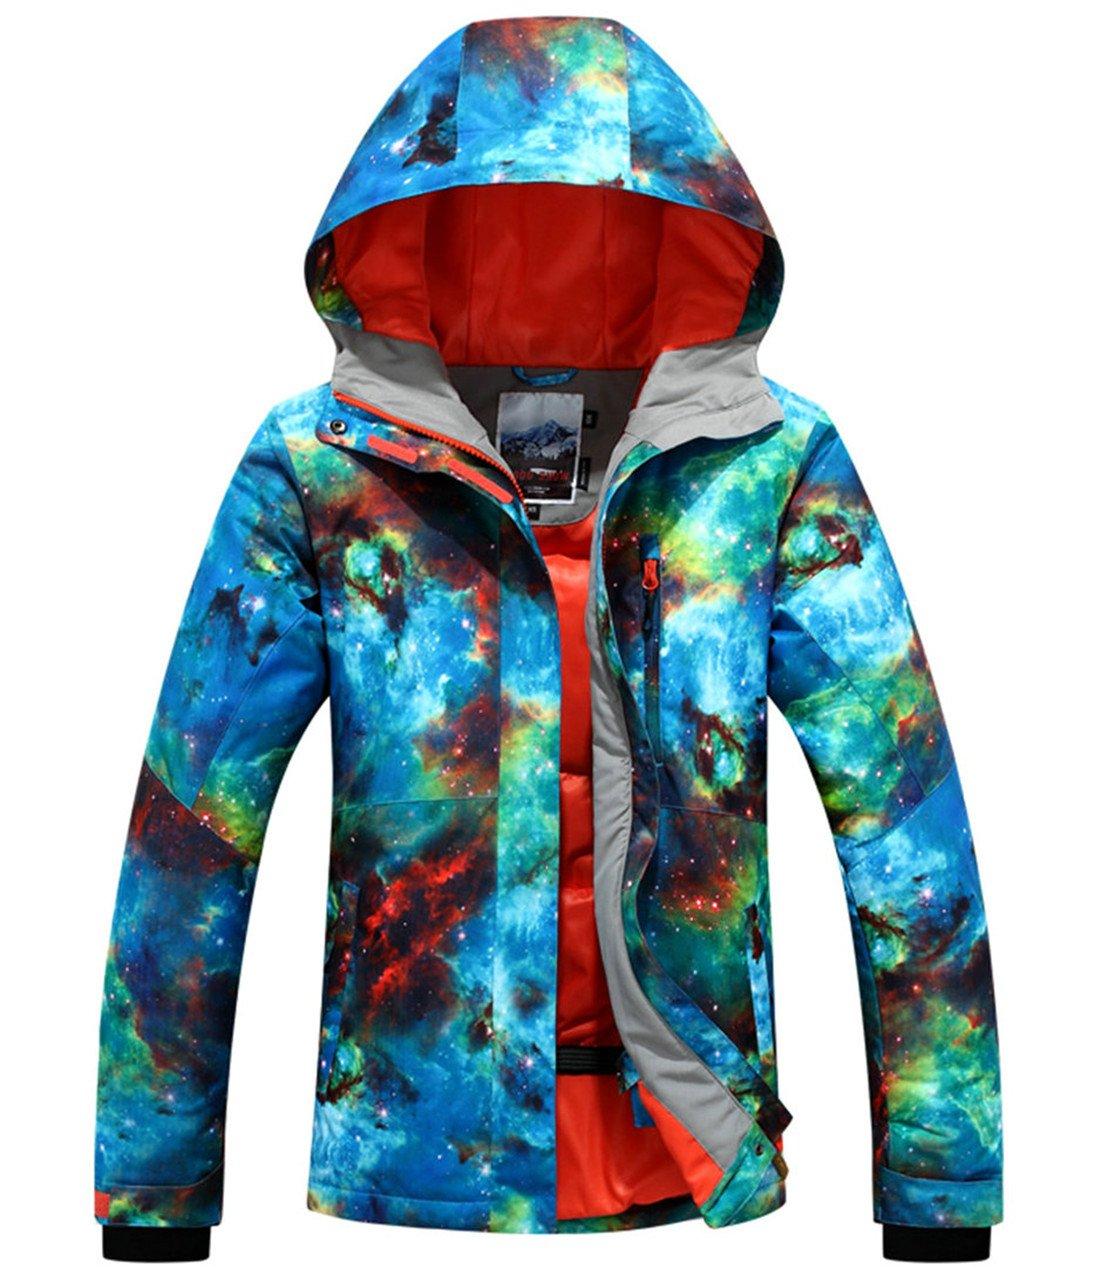 APTRO Women's Waterproof Snowboard Ski Jacket Windproof Snow Jacket #659 S